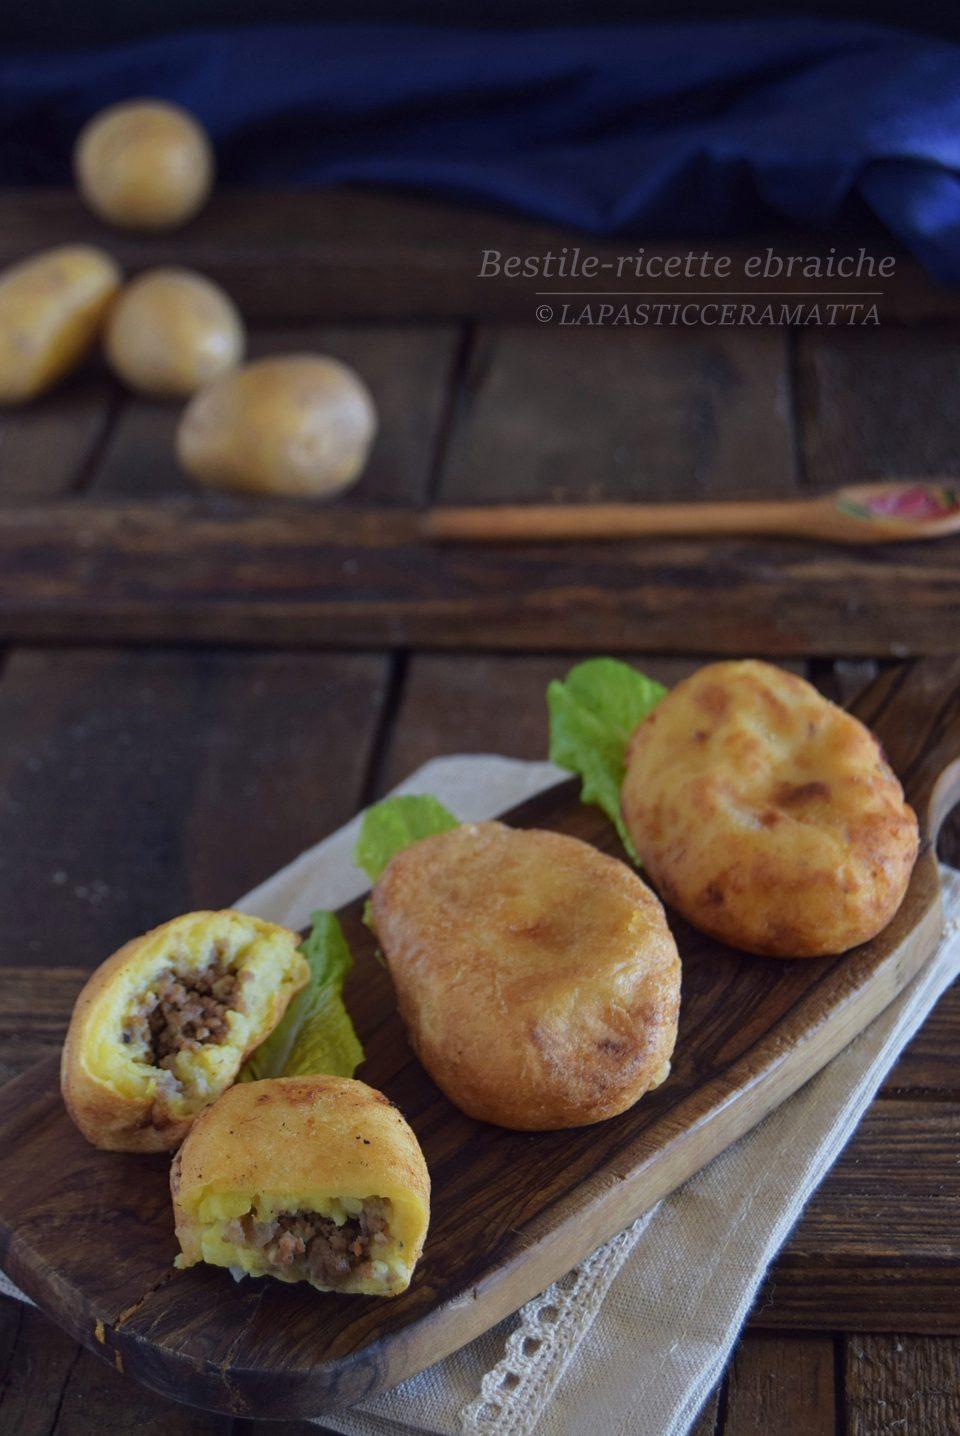 Bestile polpette di patate ripiene -ricette ebraiche